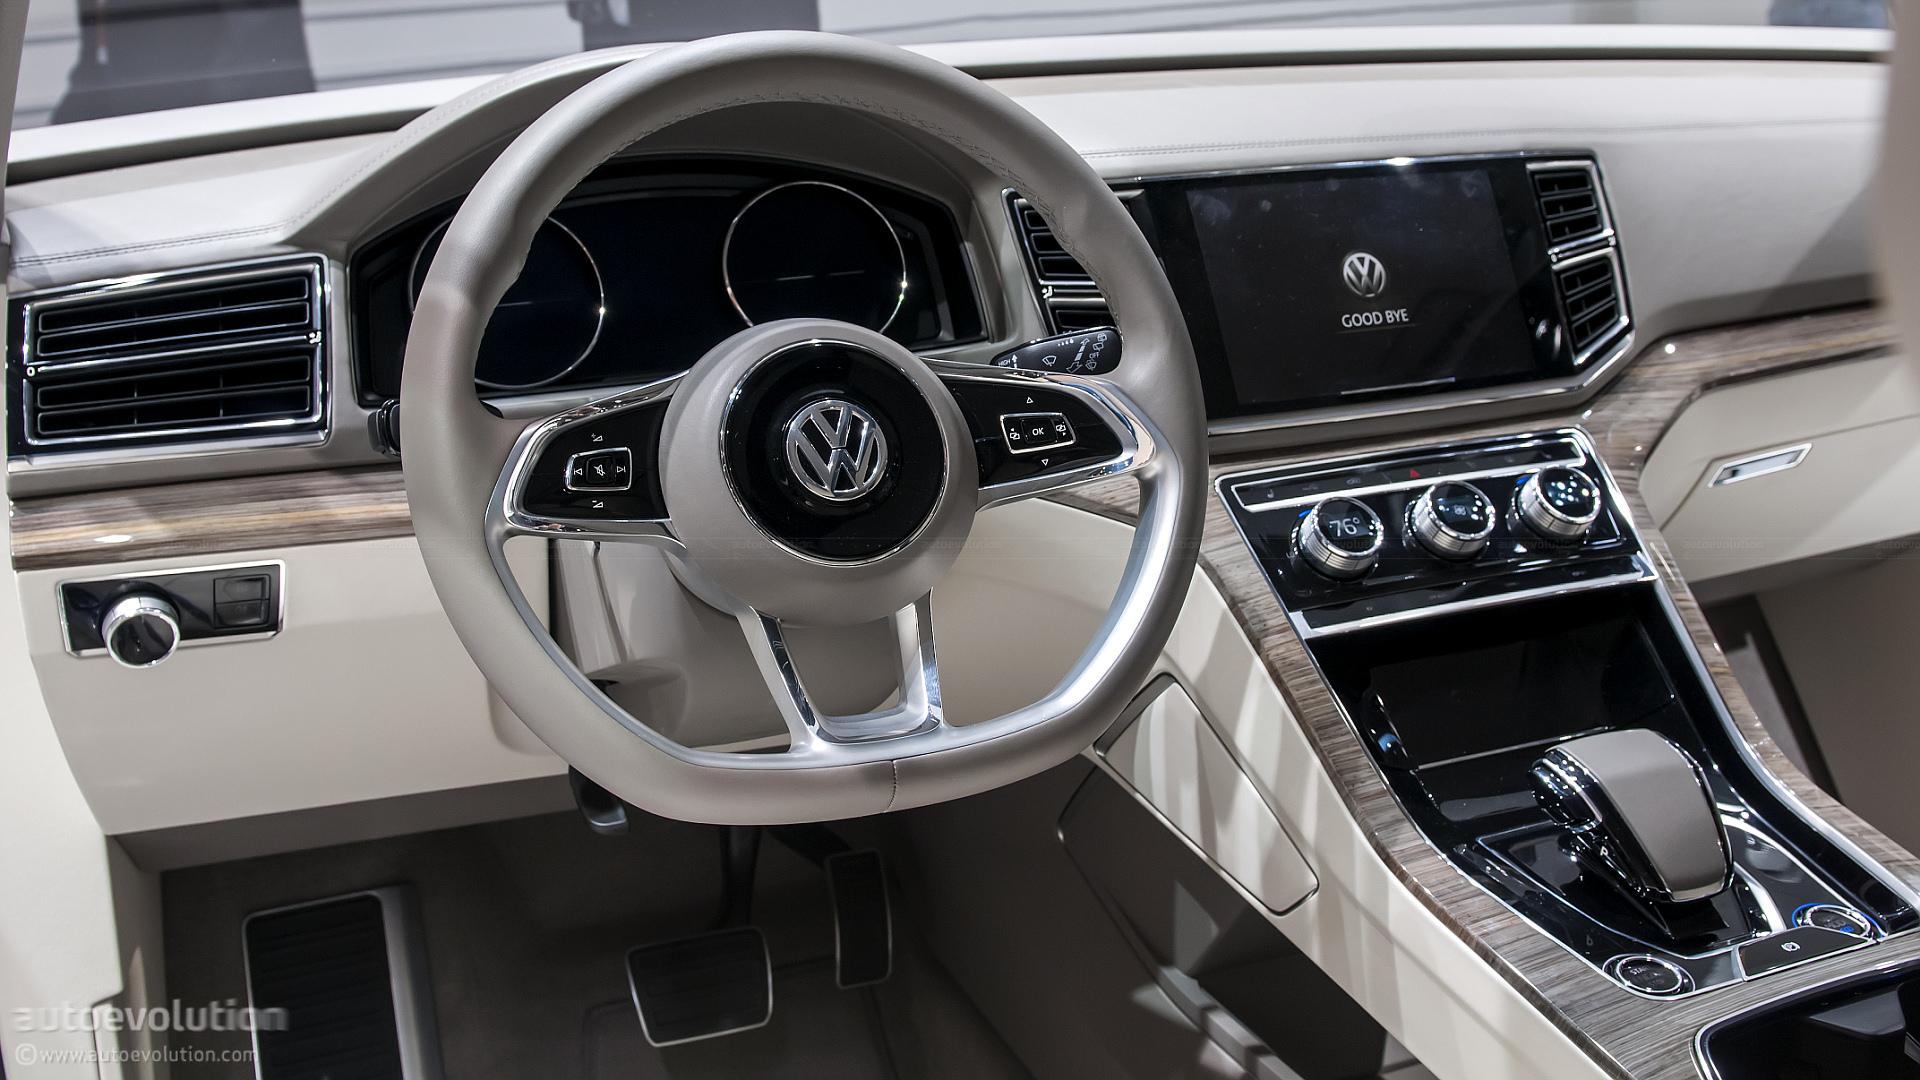 2013 NAIAS: Volkswagen CrossBlue Concept [Live Photos] - autoevolution